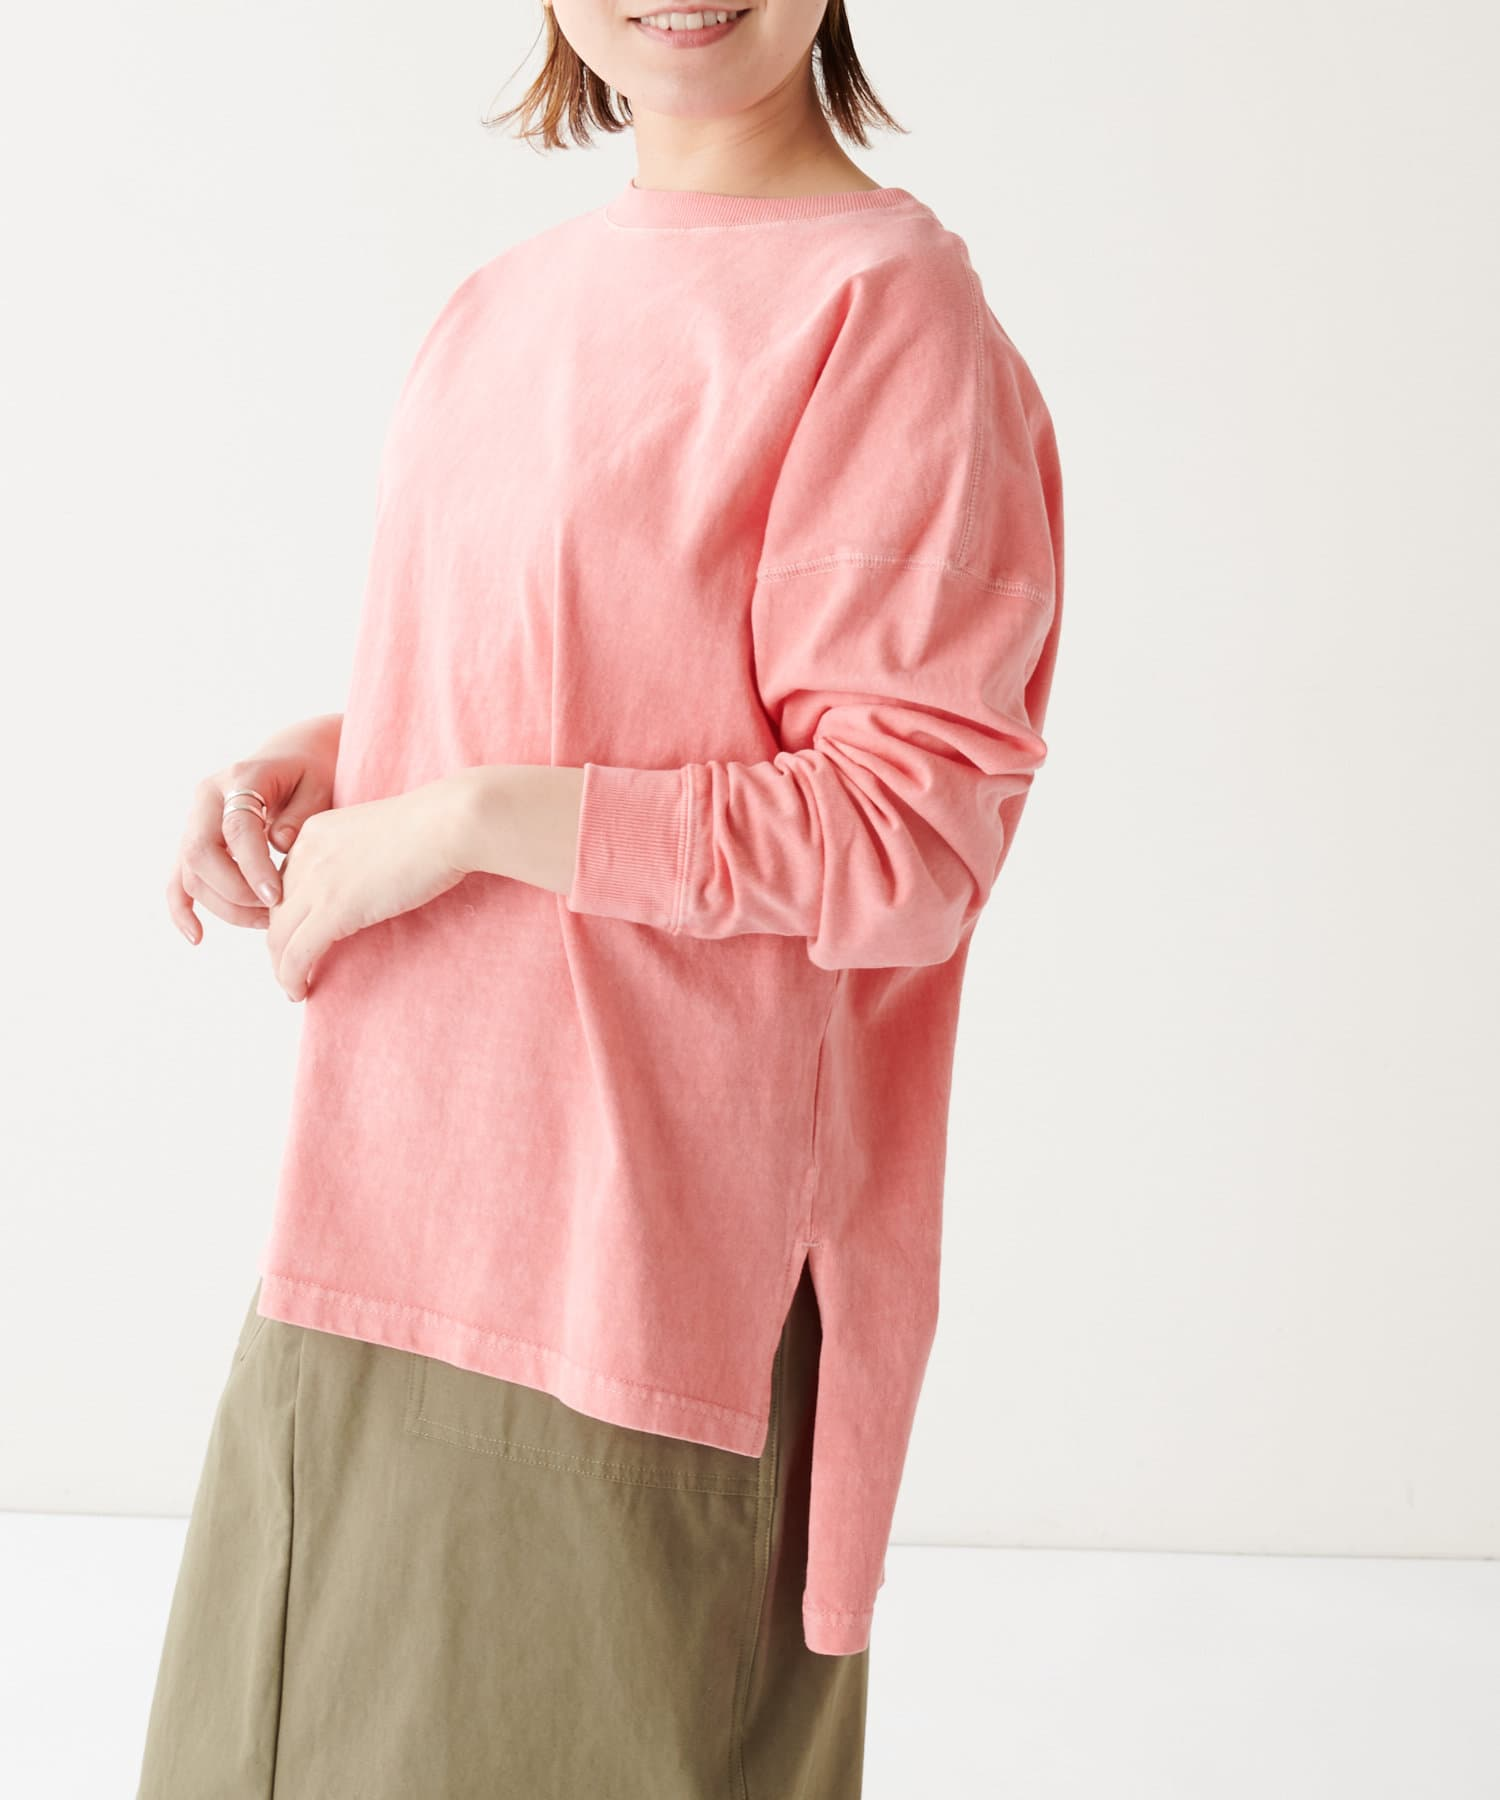 BONbazaar(ボンバザール) 天竺バイオウォッシュムジロンTシャツ